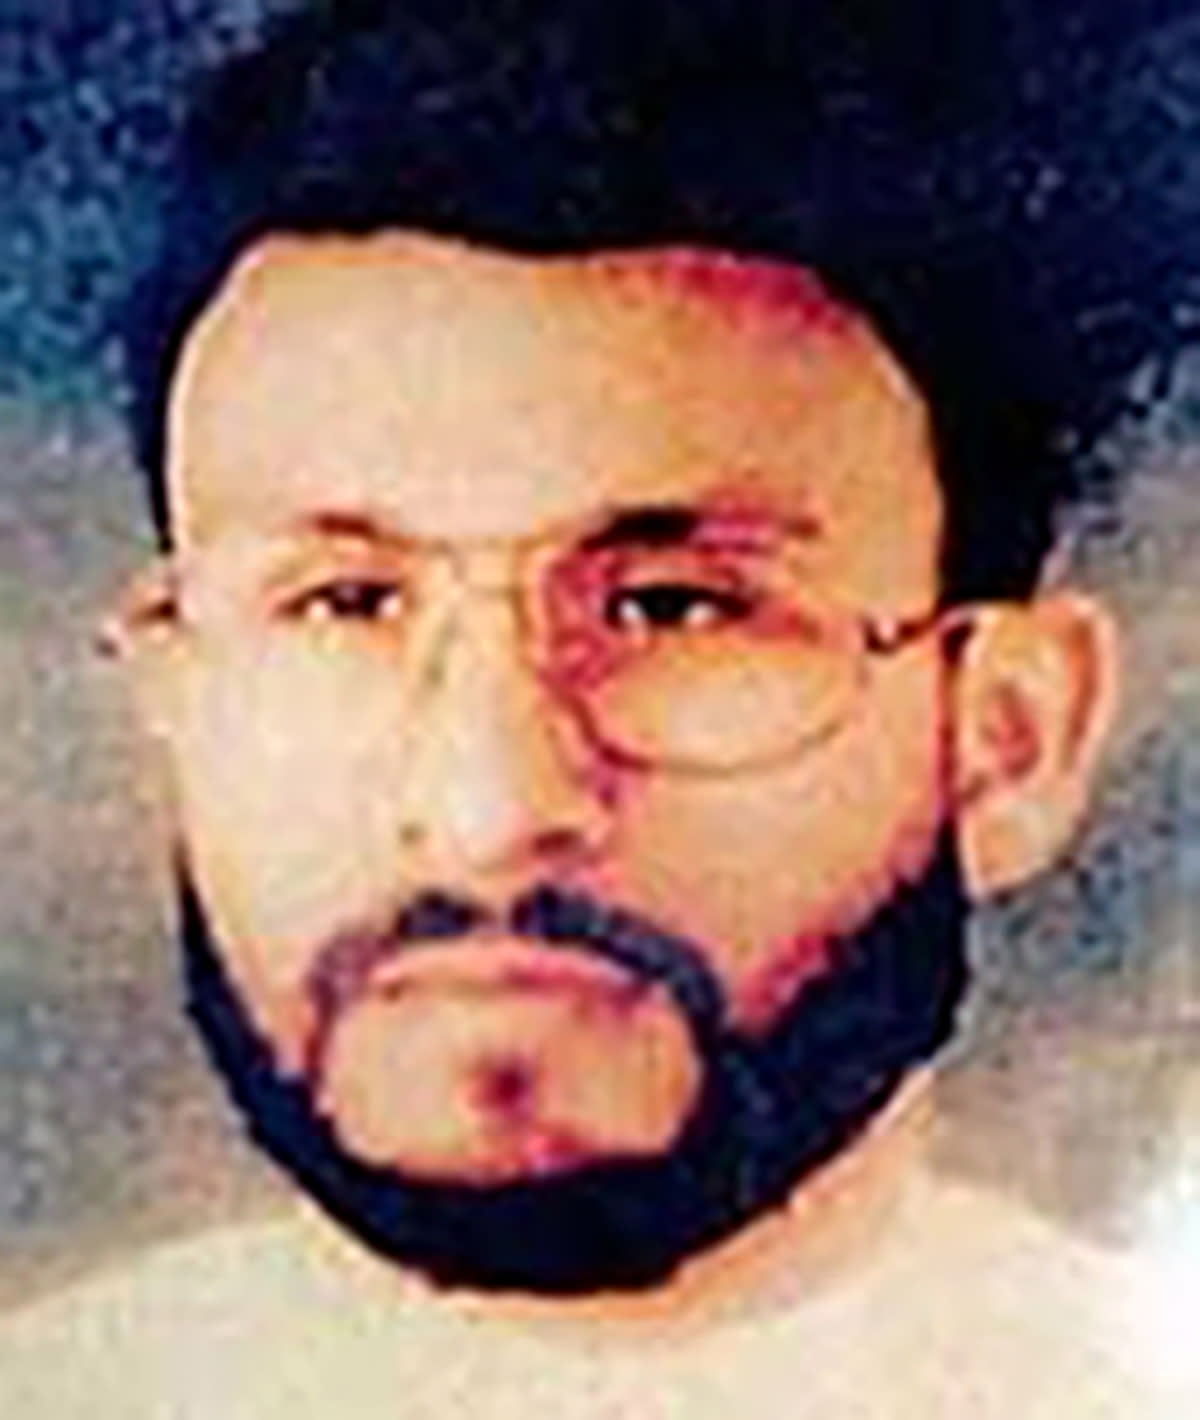 CIA Interrogator Testifies That He Threatened to Kill Prisoner's Son